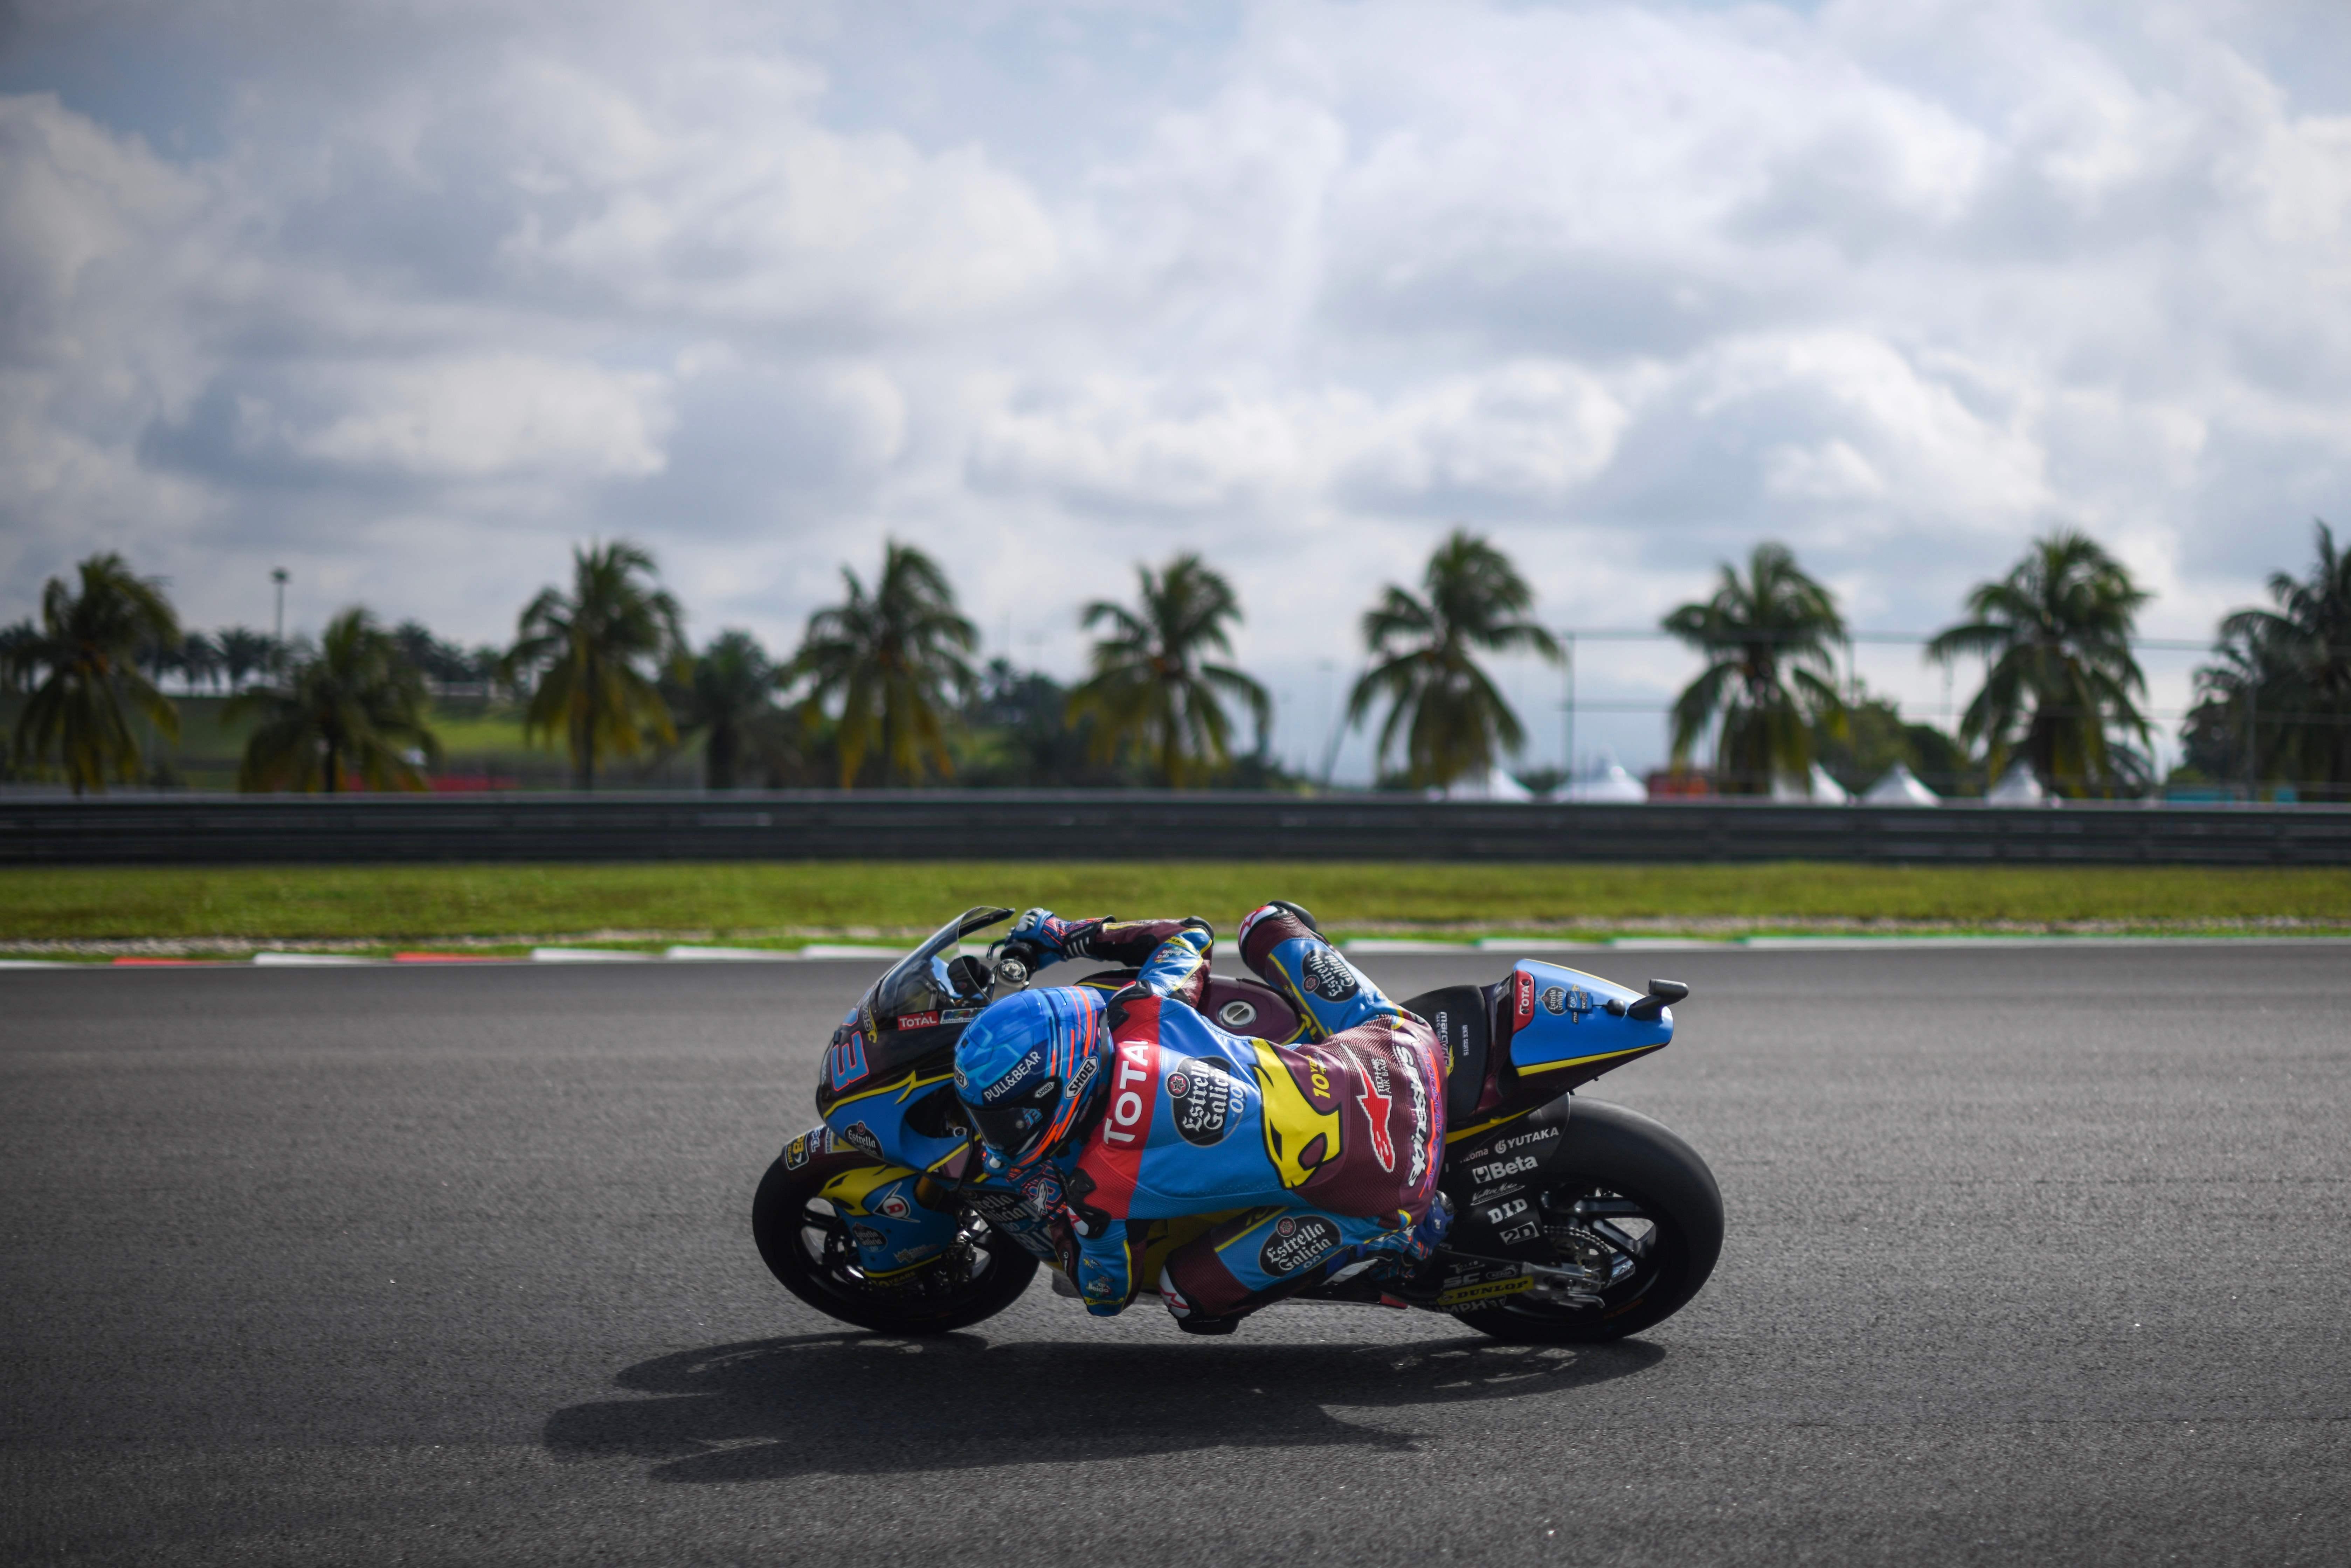 El piloto español Alex Márquez en el circuito de Sepang (Malasia).